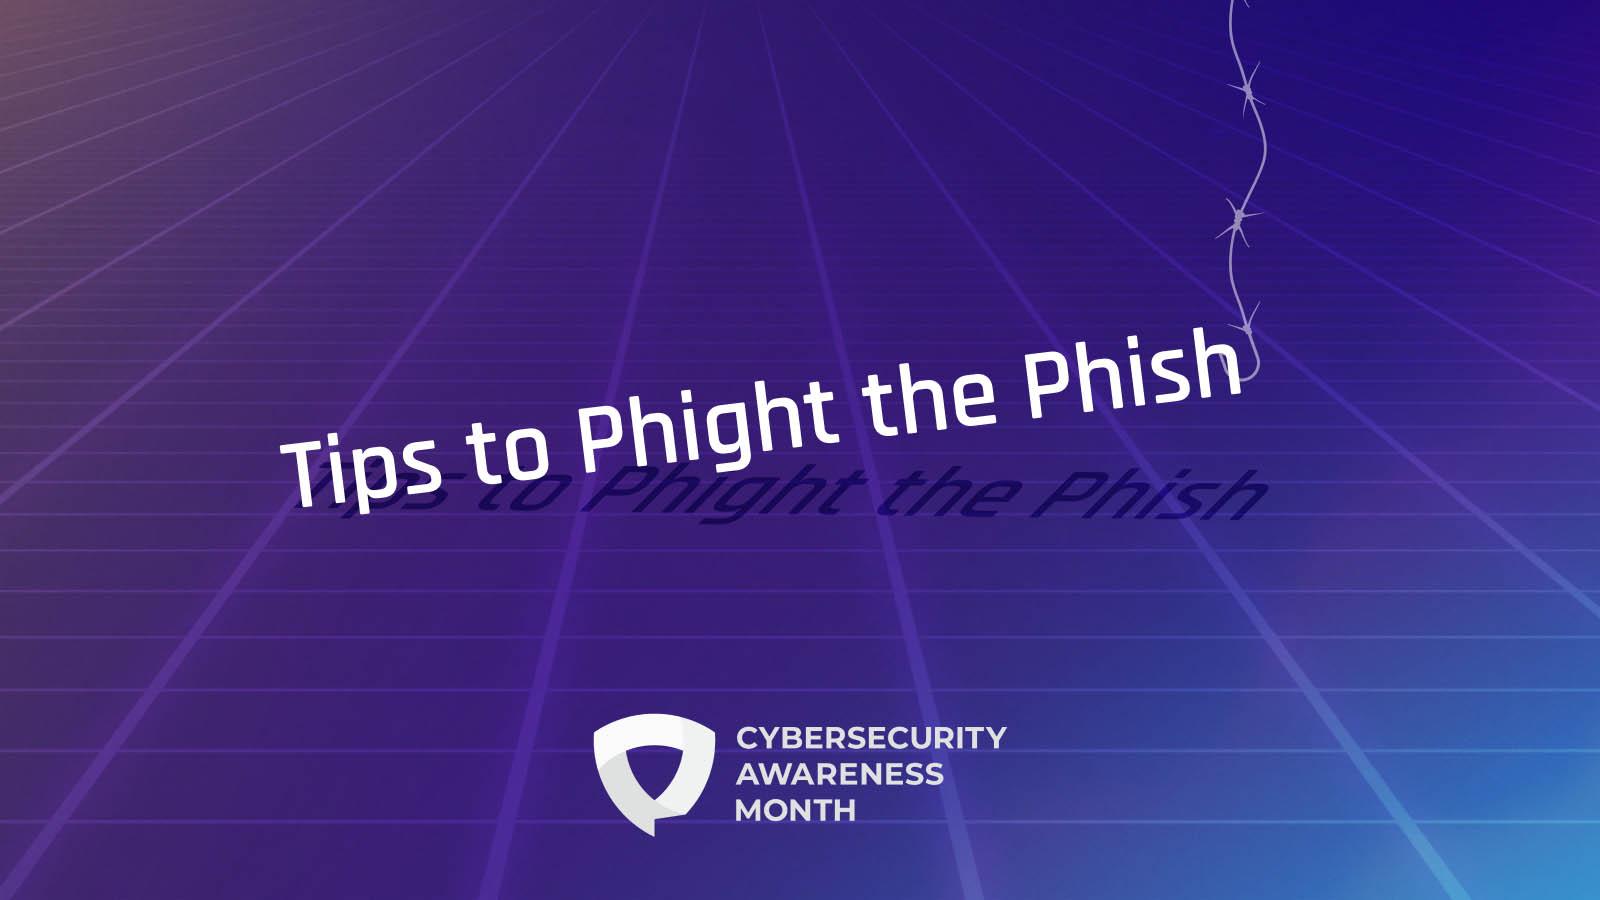 Phight the Phish: Best Practices for Phishing Prevention